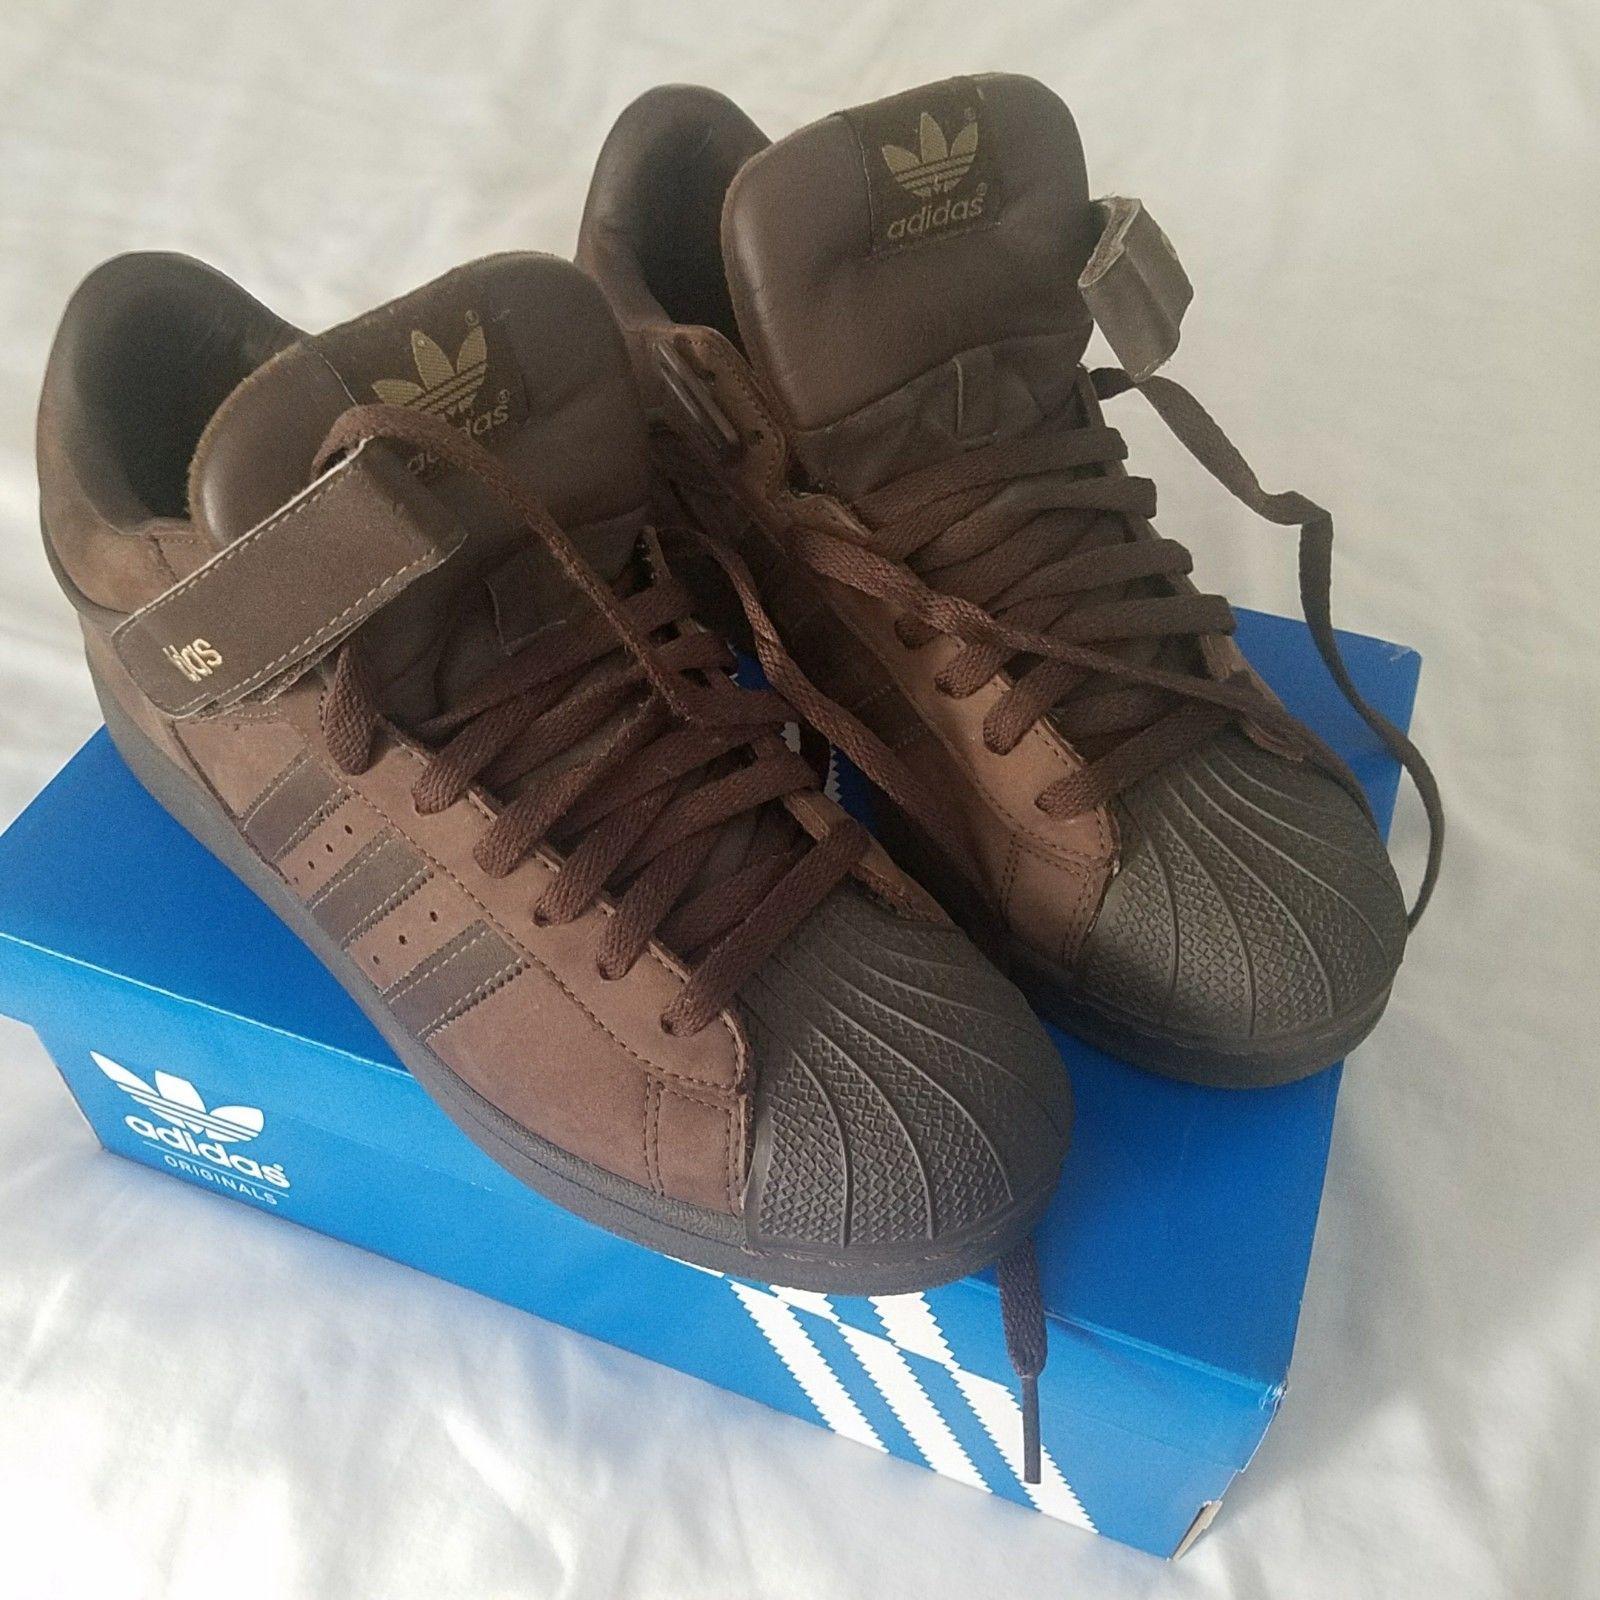 Adidas Shell Toe Pro Model quarter top Brown on Brown Men